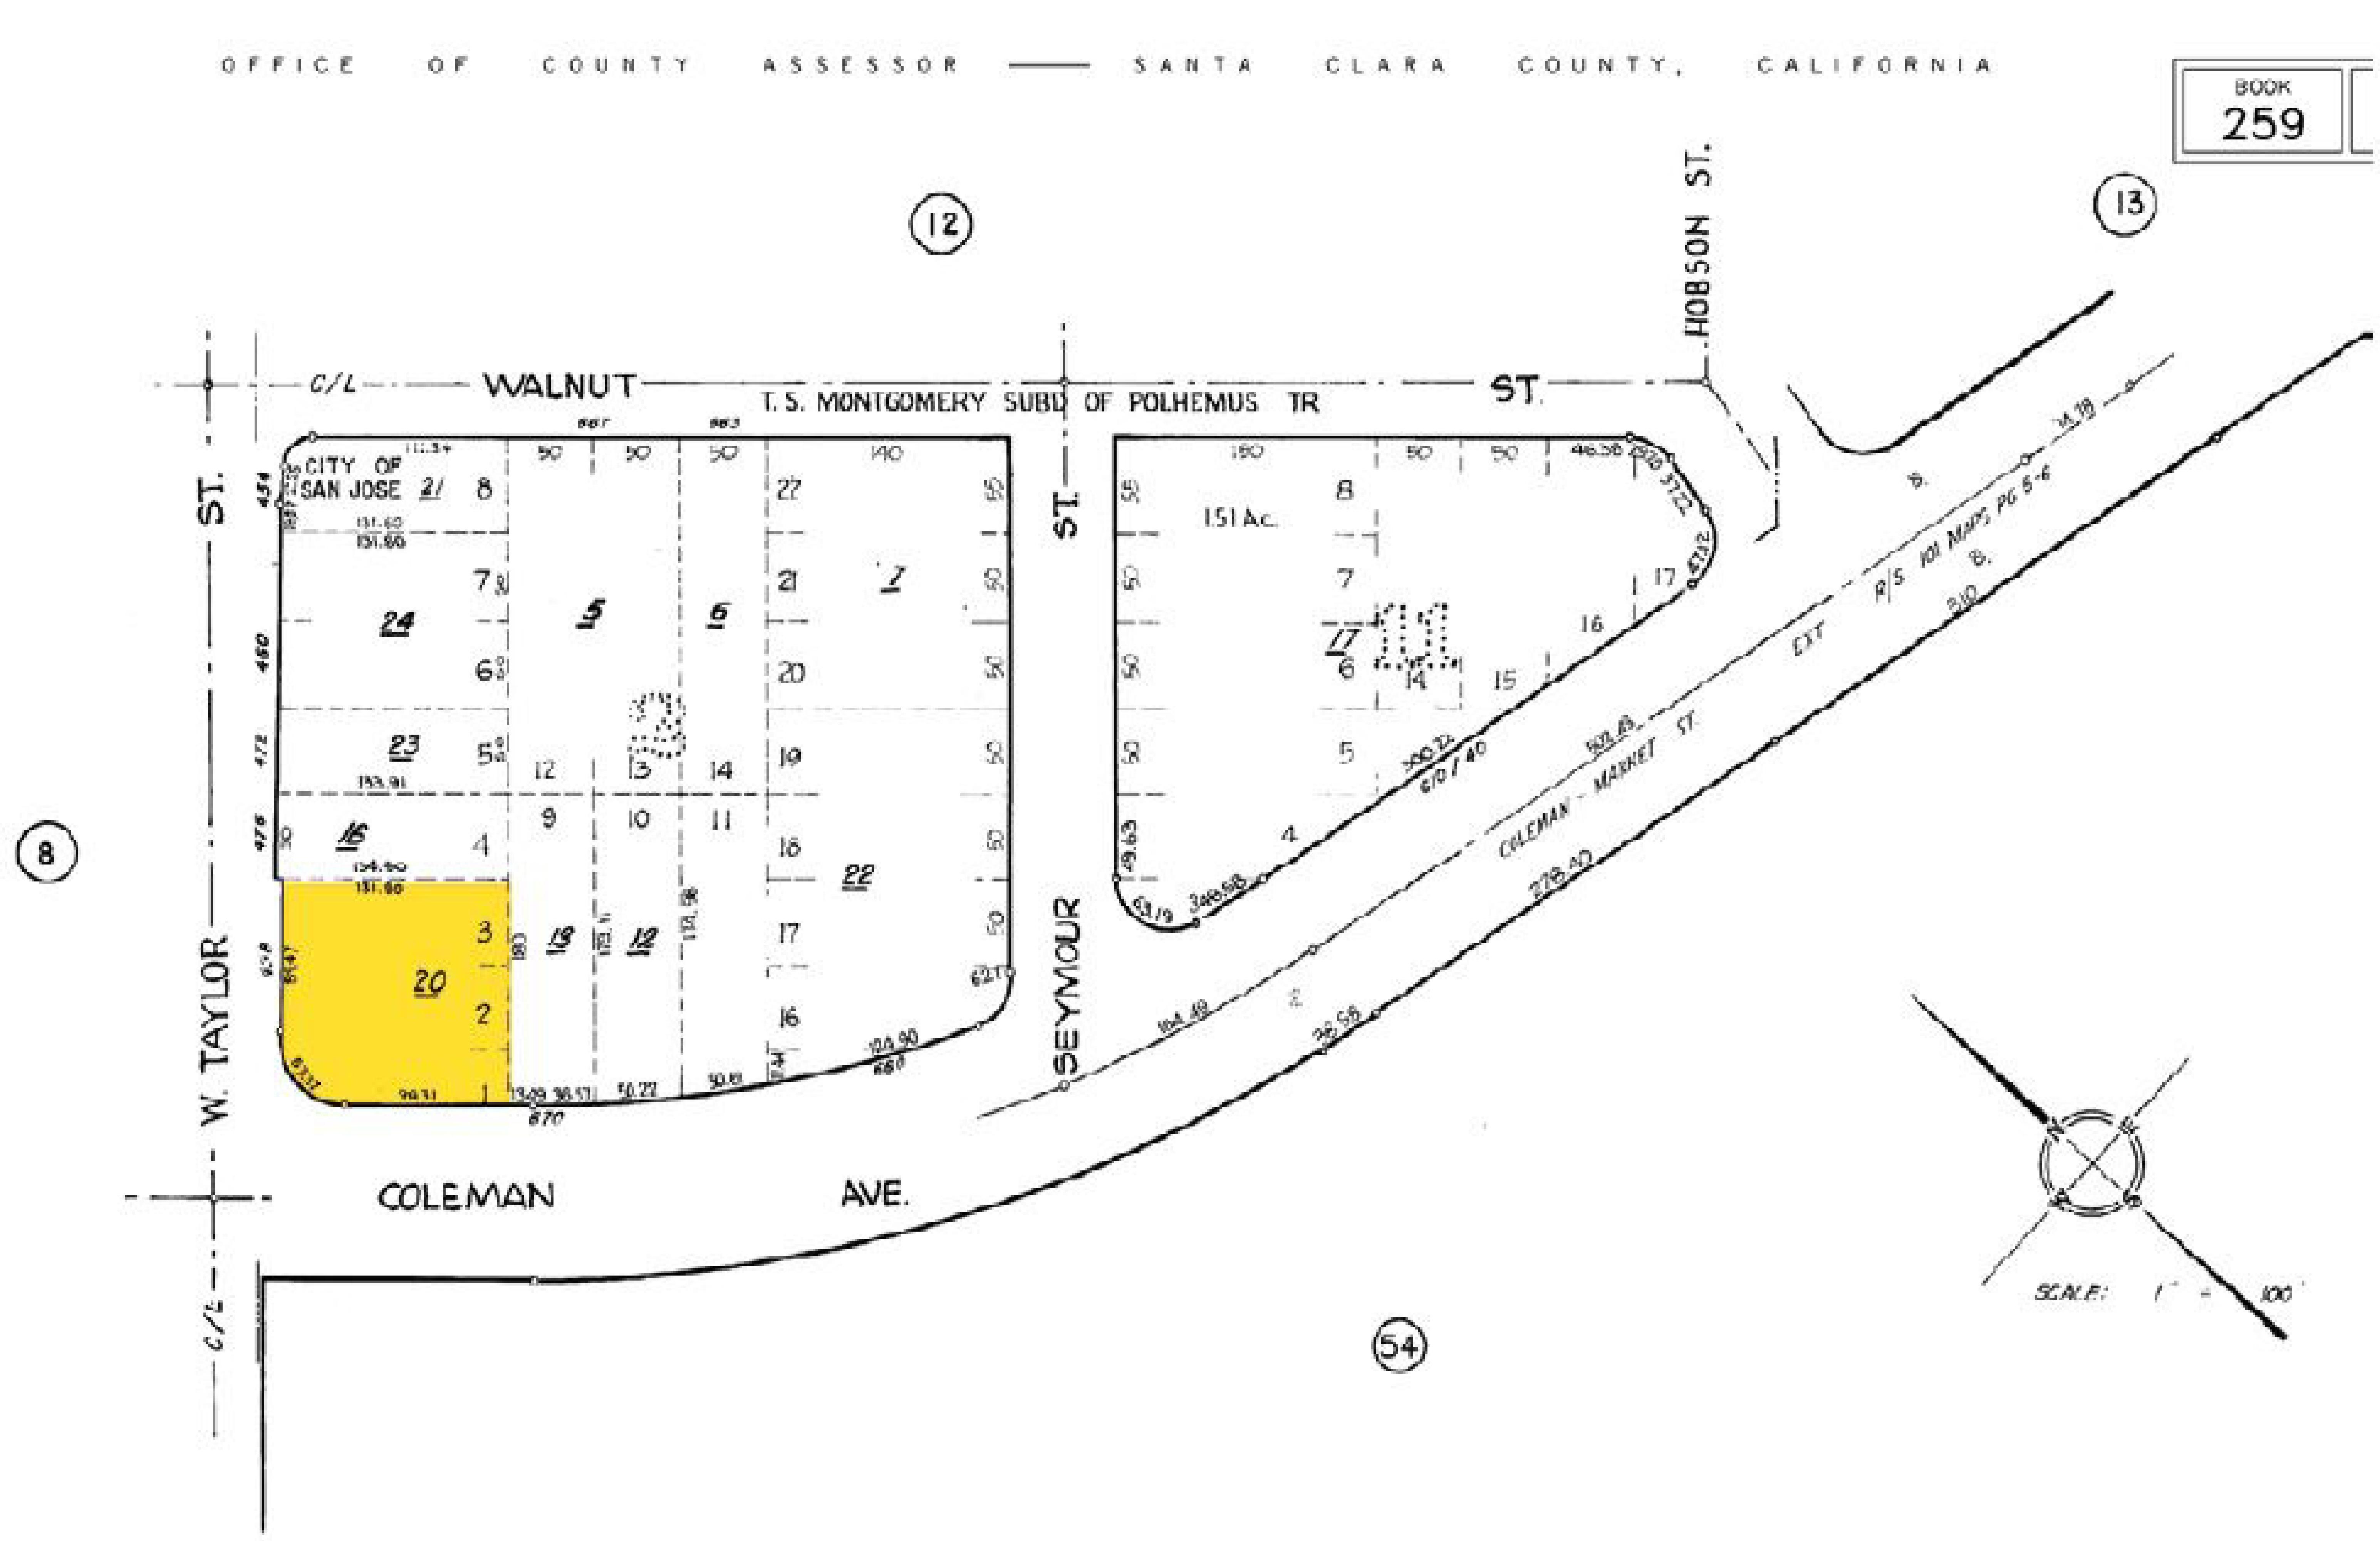 498 W. Taylor Street: site plan